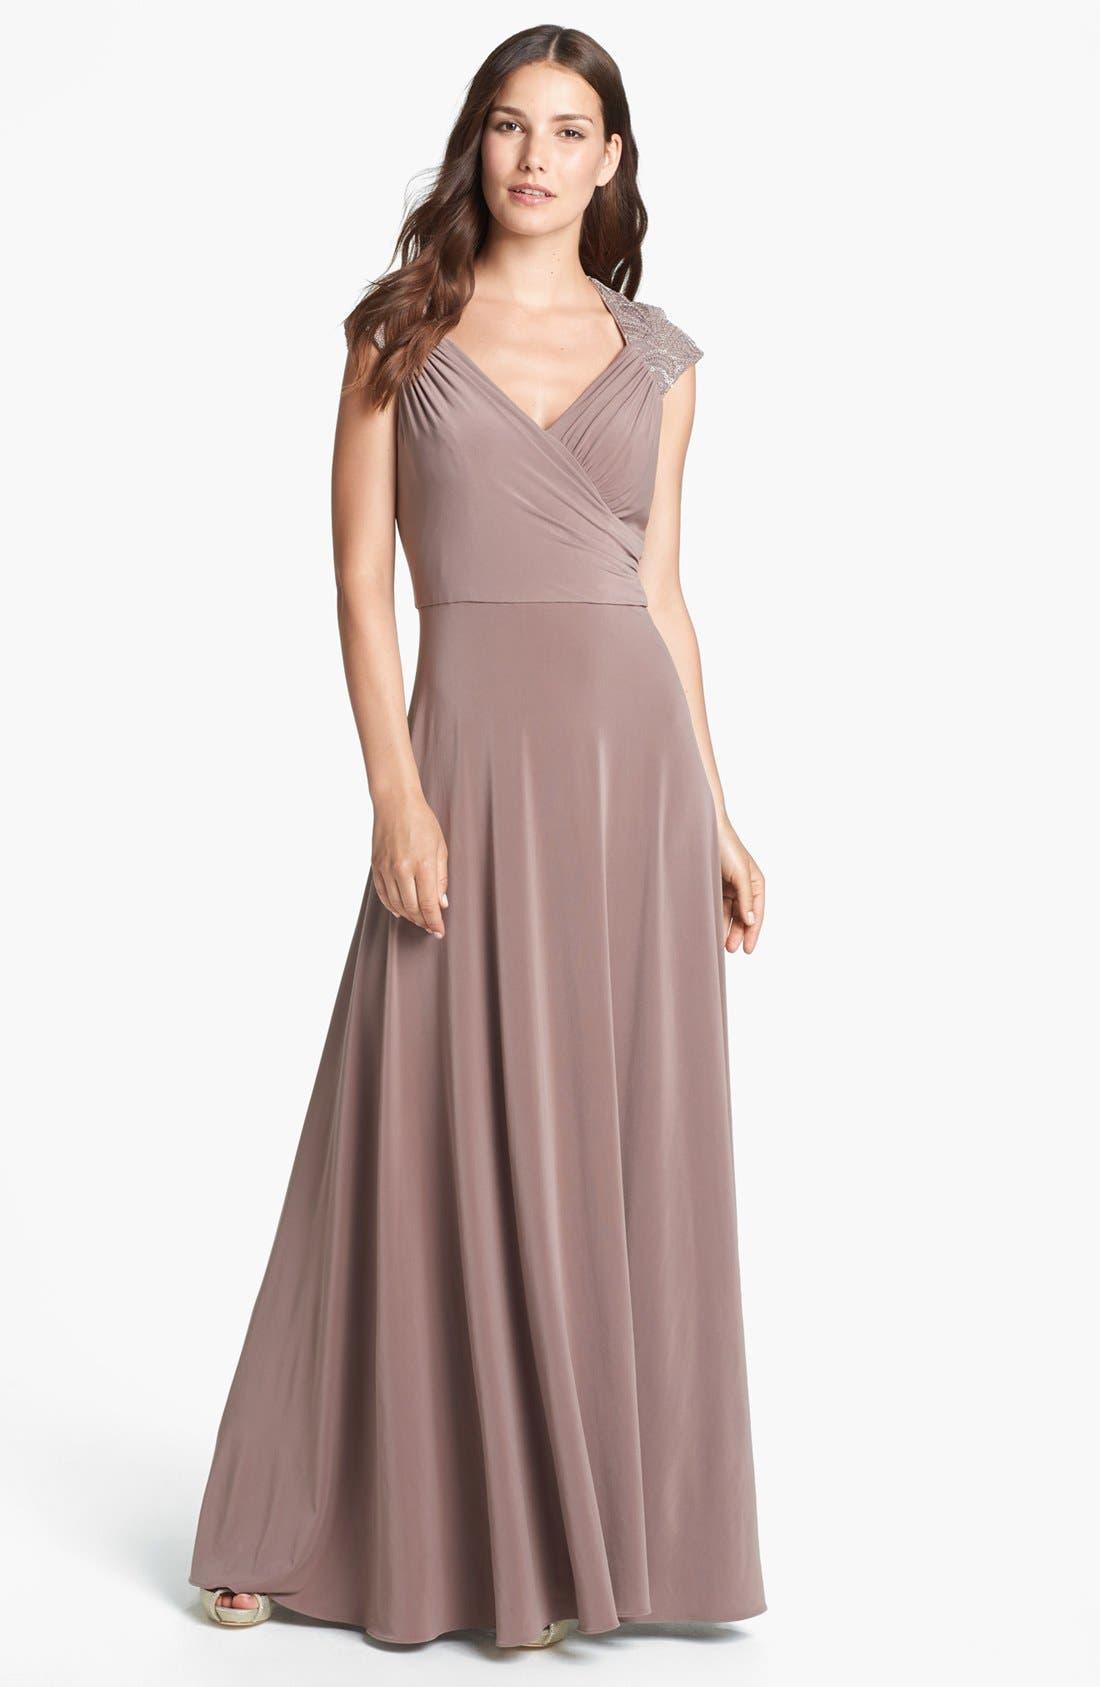 Main Image - Patra Embellished Sequin Yoke Jersey Gown (Regular & Petite)